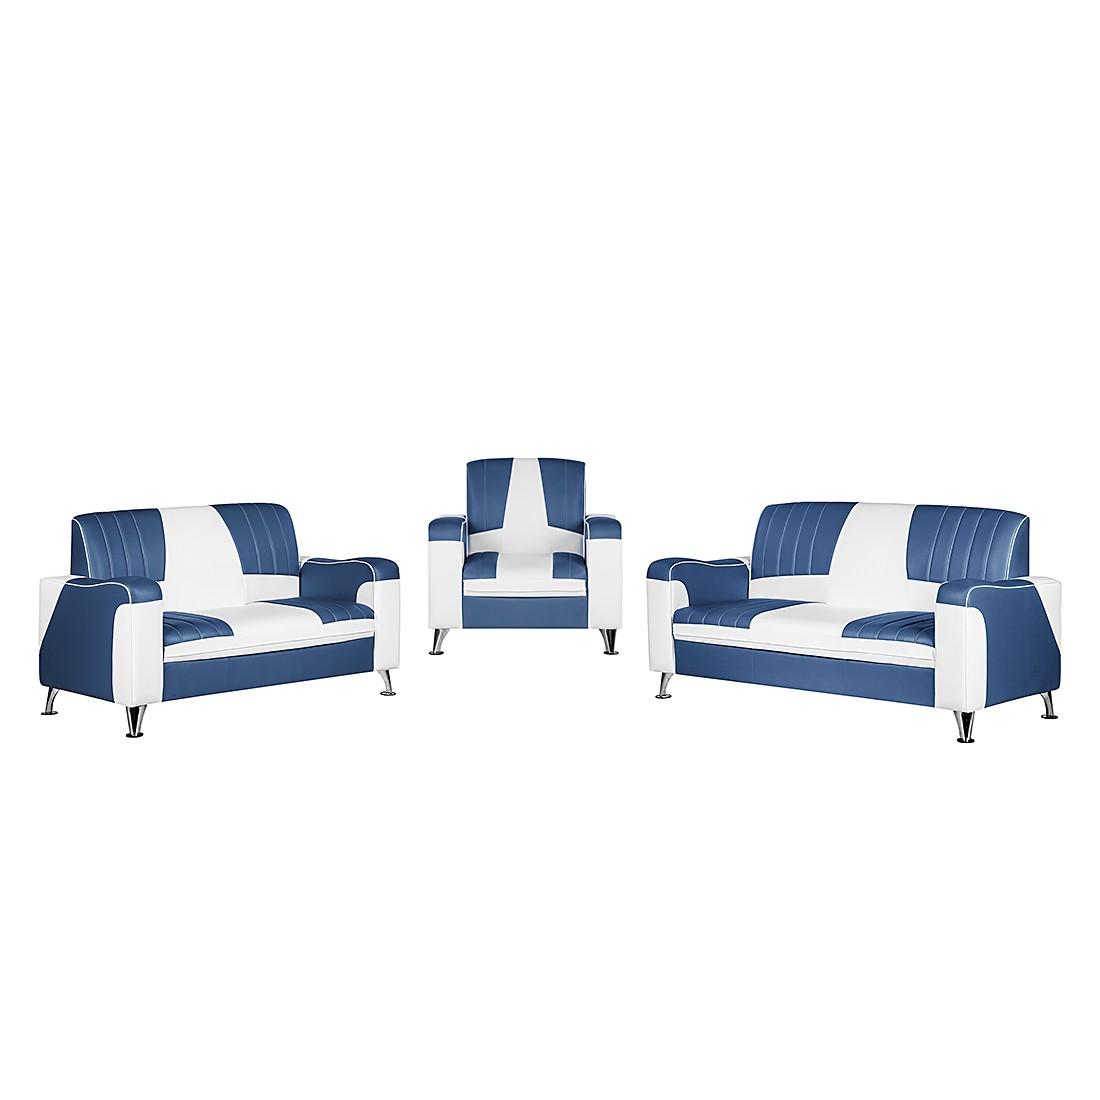 Canapé panoramique Nixa (3 -2 -1) - Cuir synthétique - Blanc / Bleu foncé, Studio Monroe